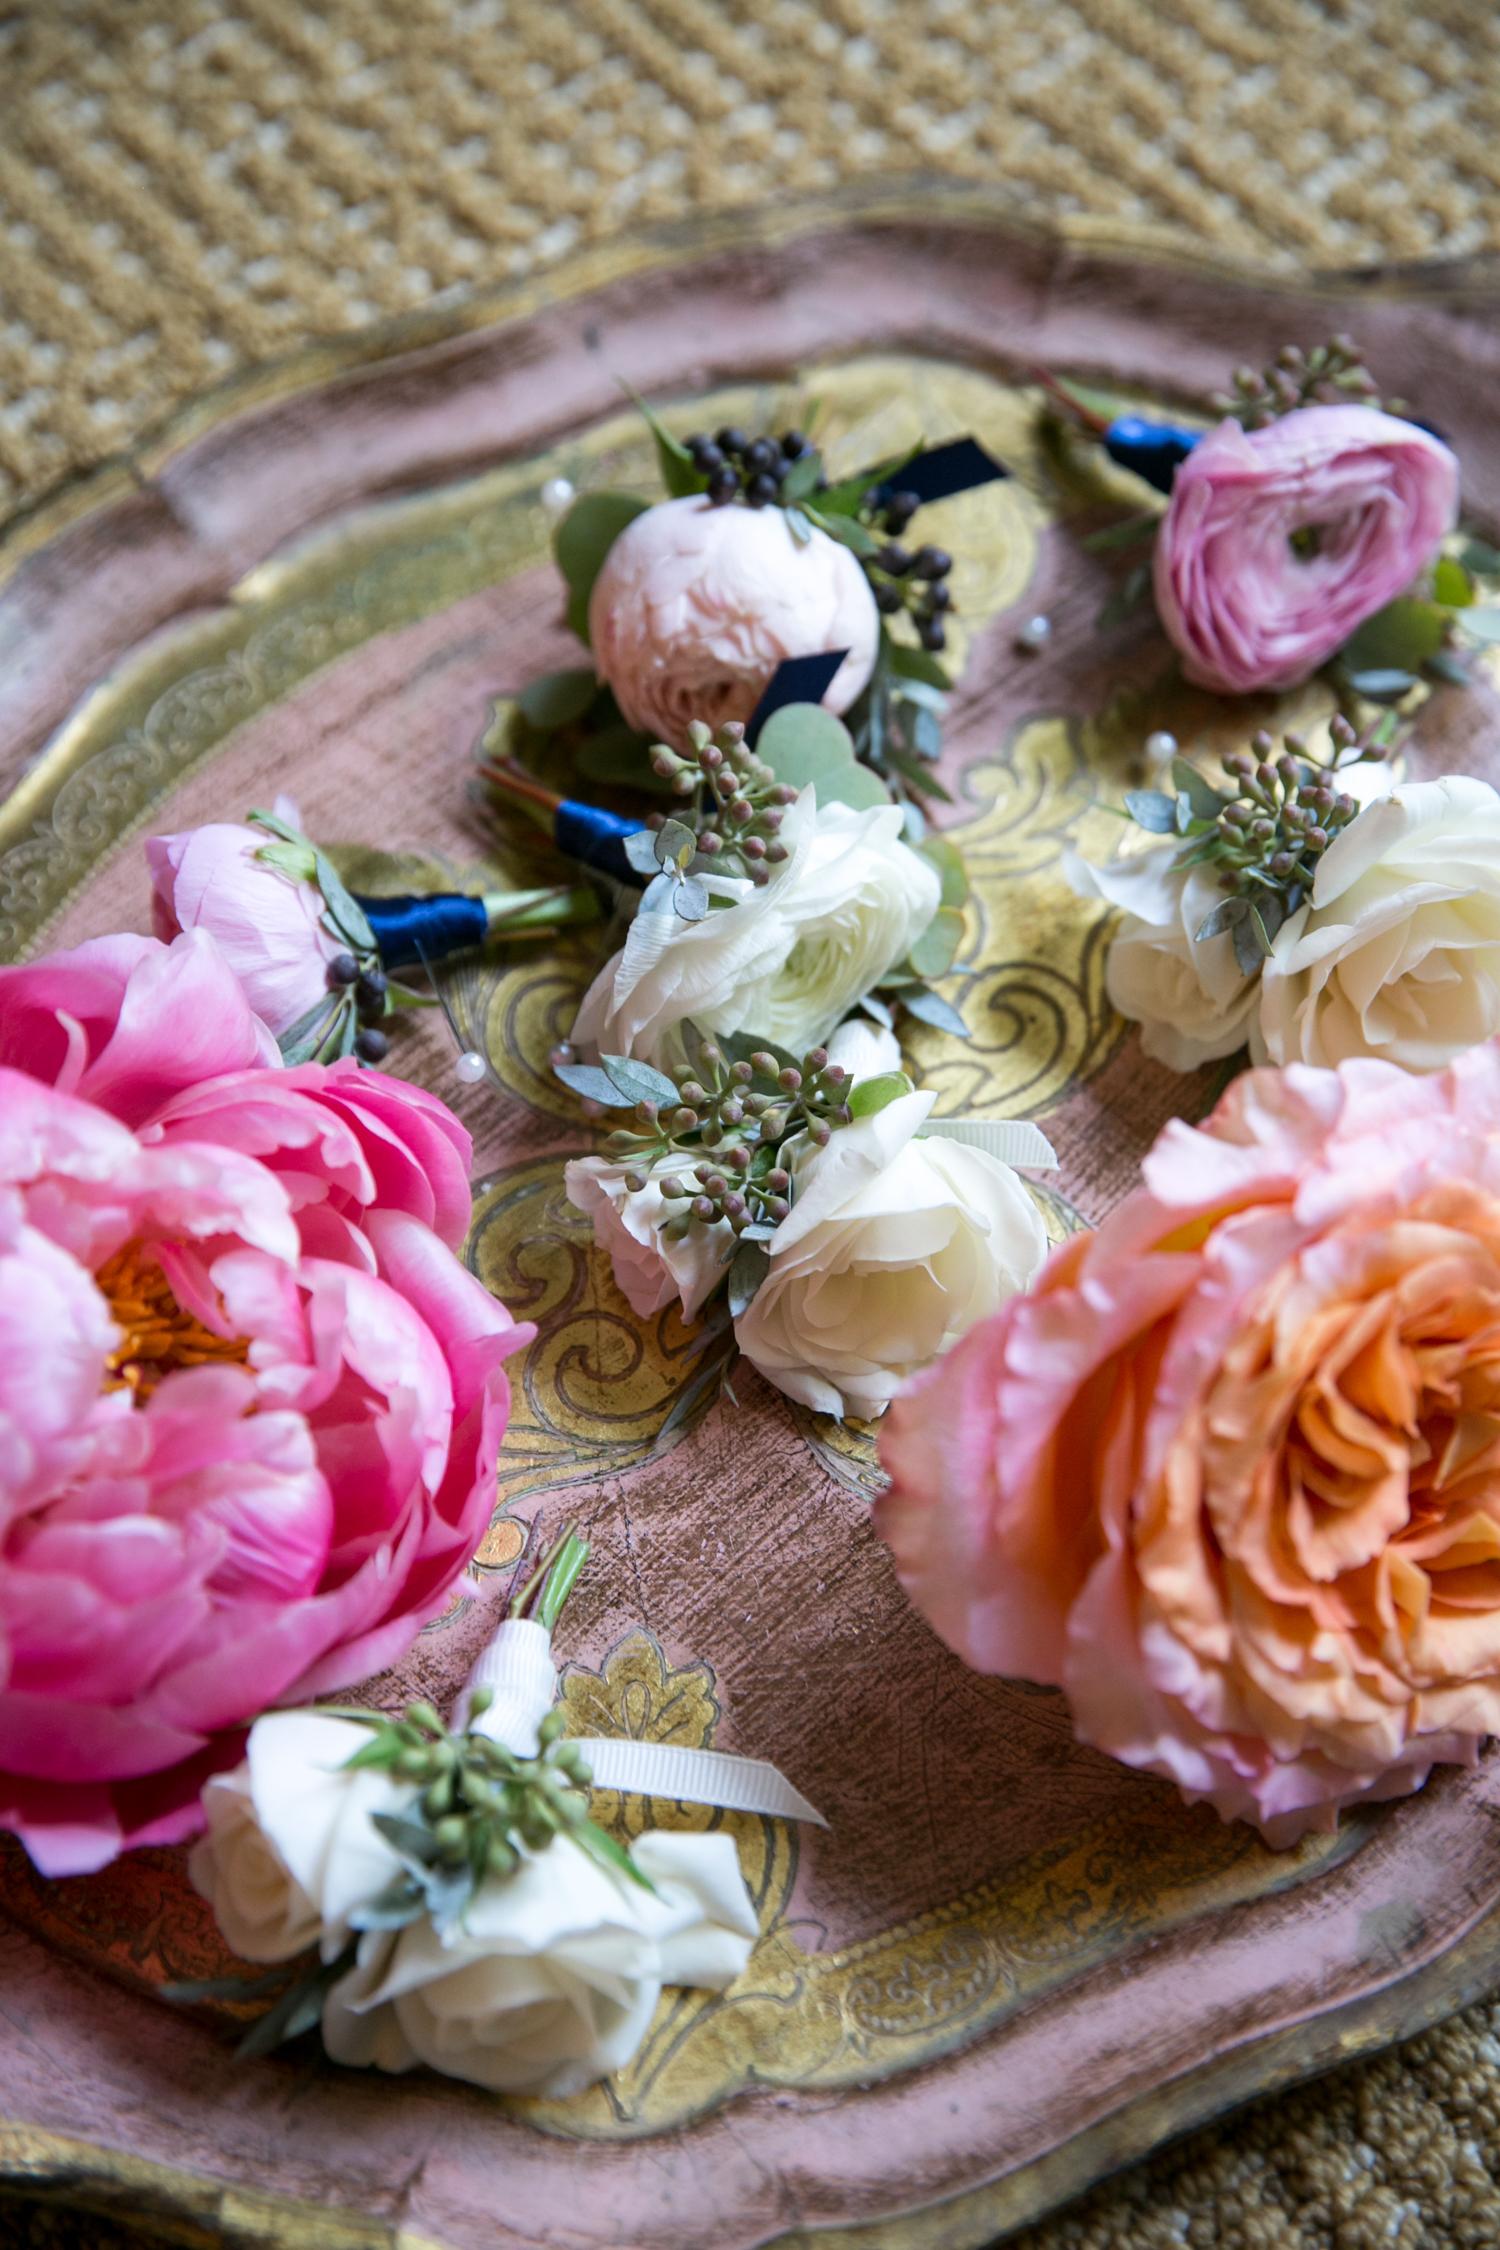 www.santabarbarawedding.com | Miki & Sonja Photography | Four Seasons Resort The Biltmore | Imagine Weddings & Special Events | Rockrose Floral Design | Boutonnieres